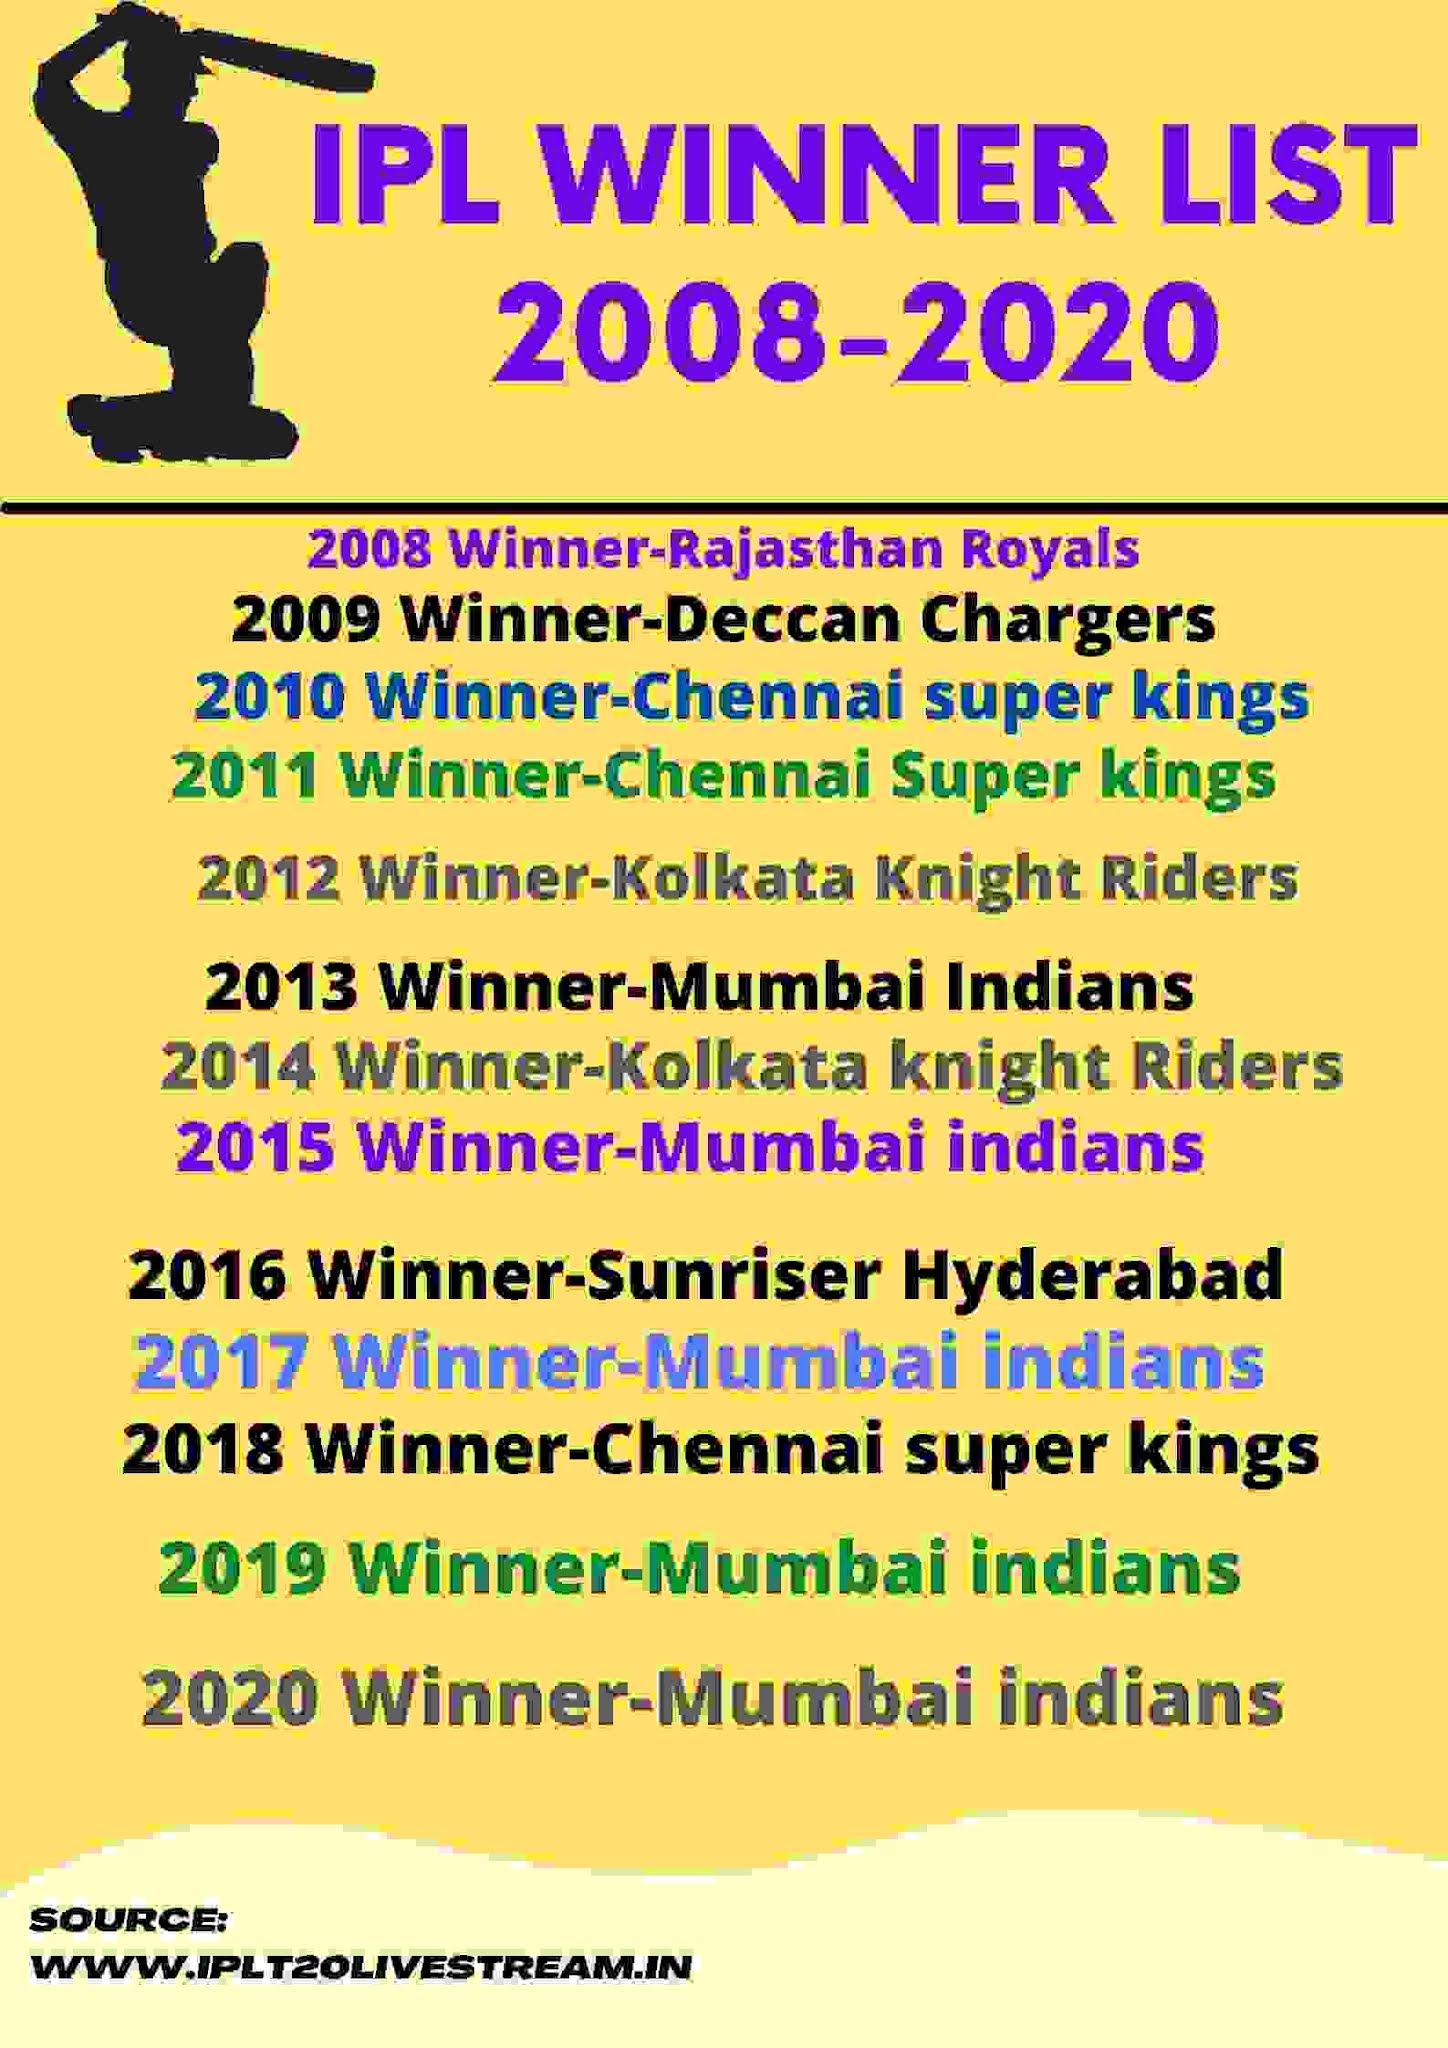 Ipl winner list in hindi 2008-2020